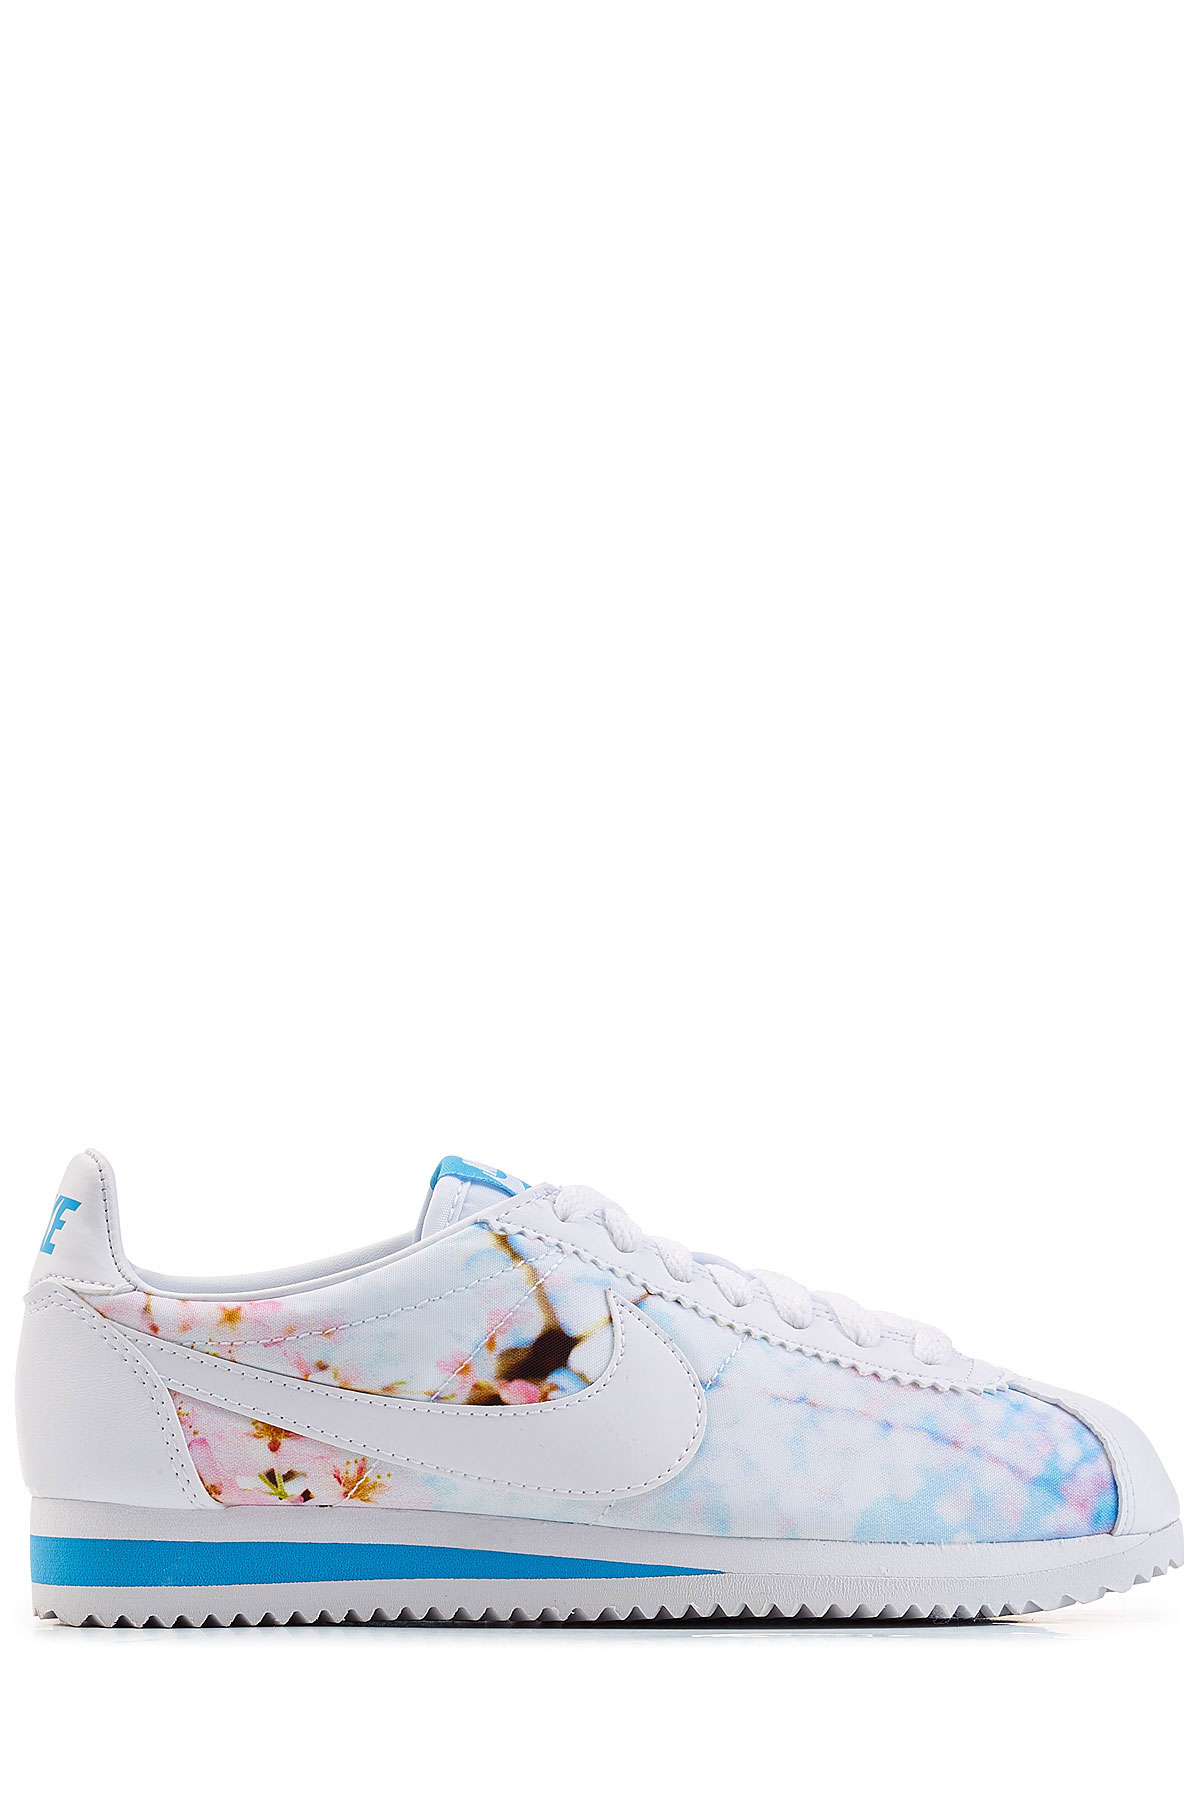 Nike Classic Cortez Blossom Cherry Blossom Cortez Leather Baskets Multicolor in 9ffc2a